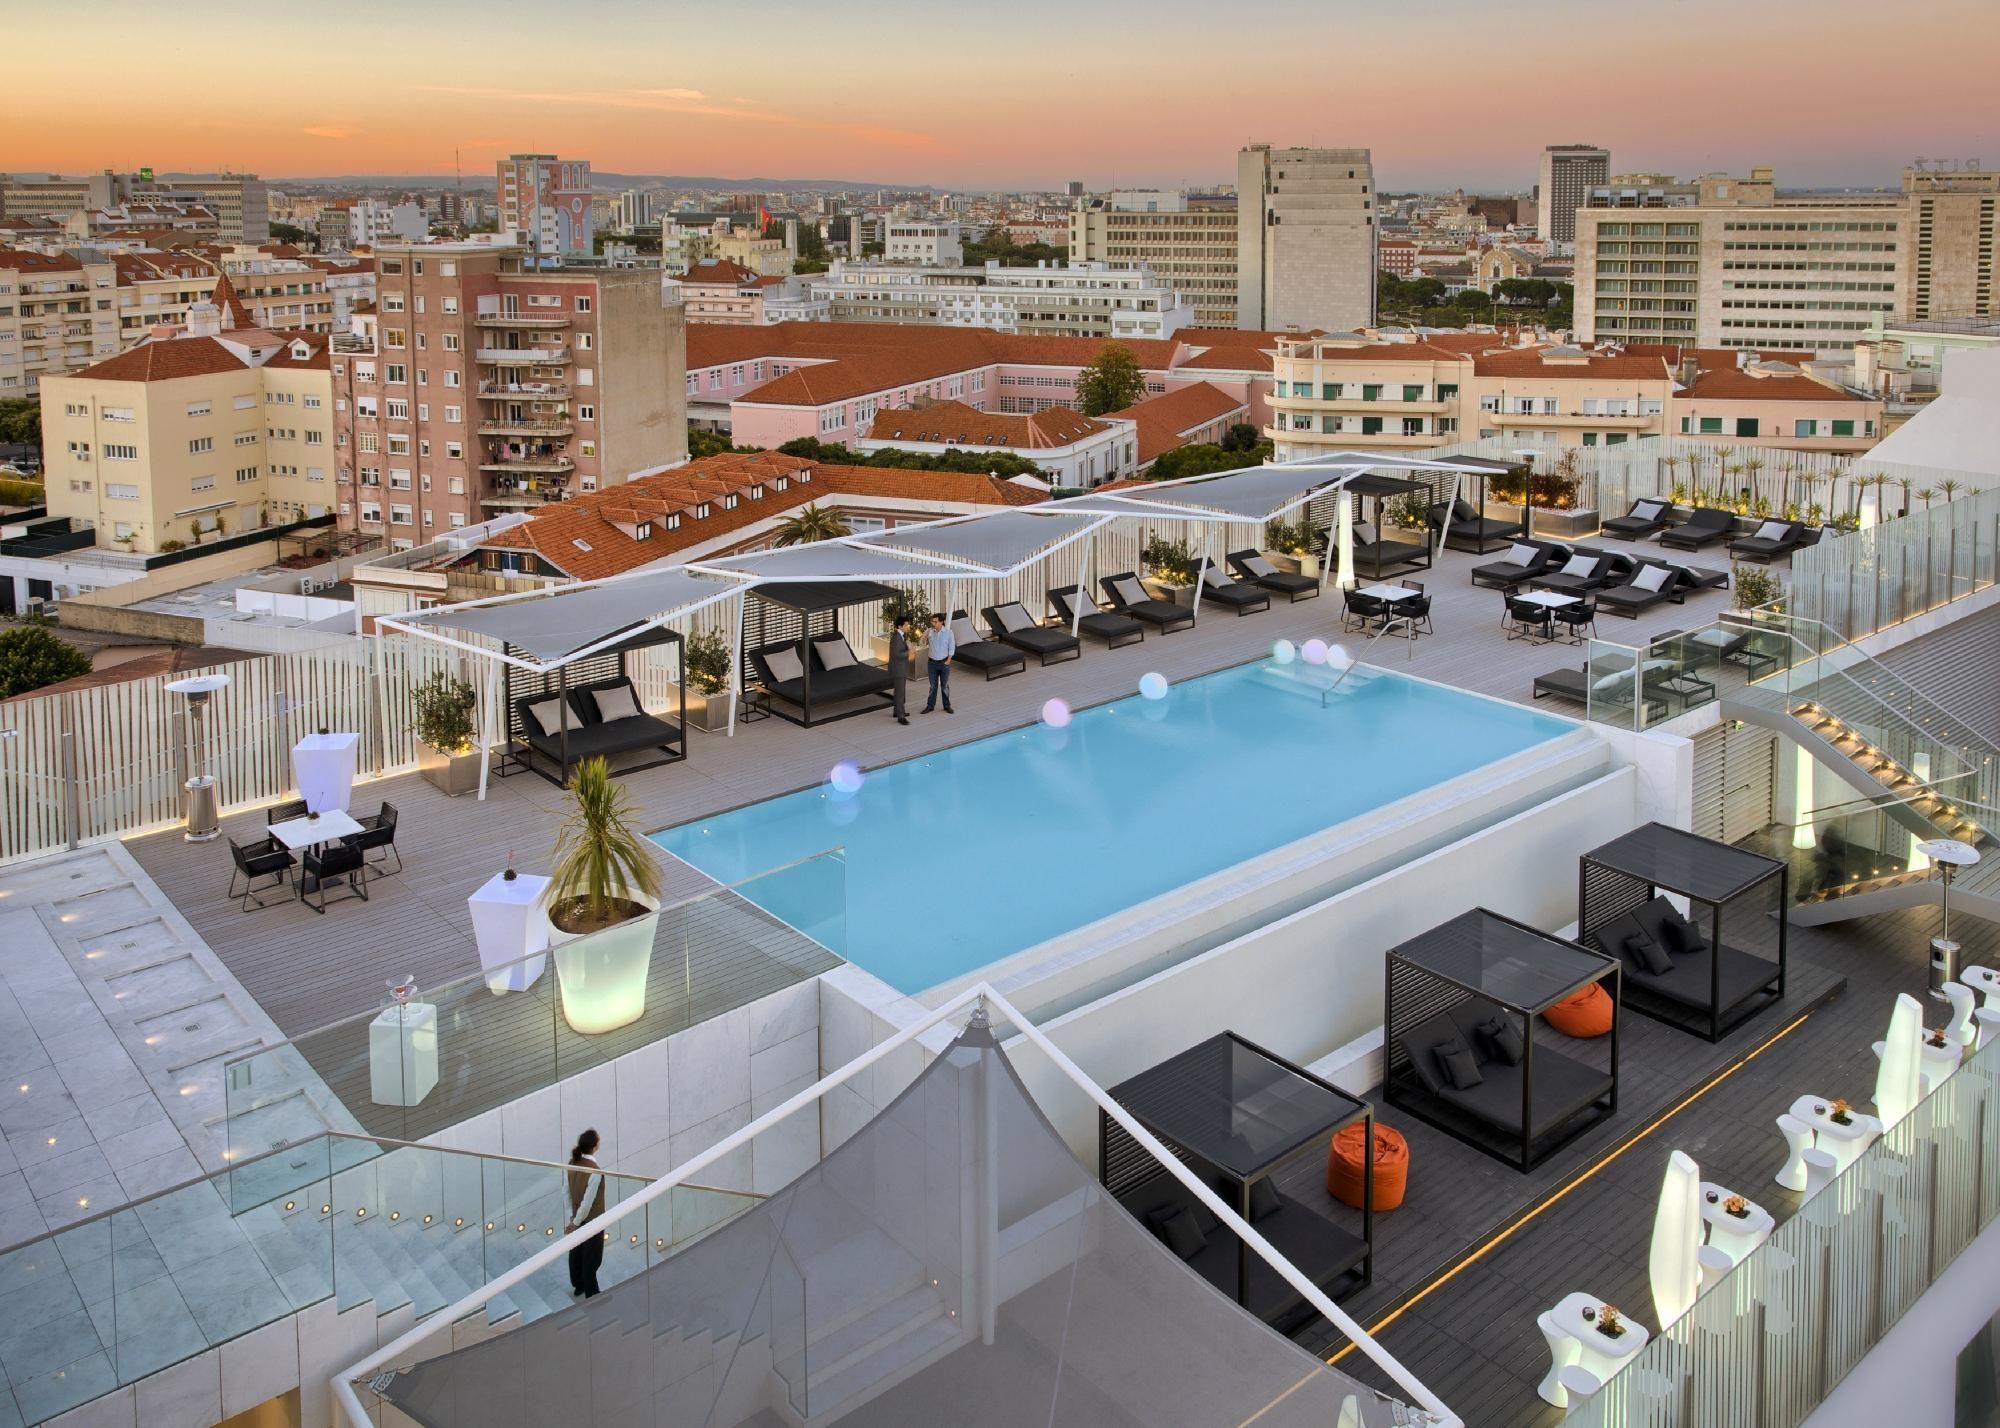 Best Sana lisboa hotel ideas on Pinterest